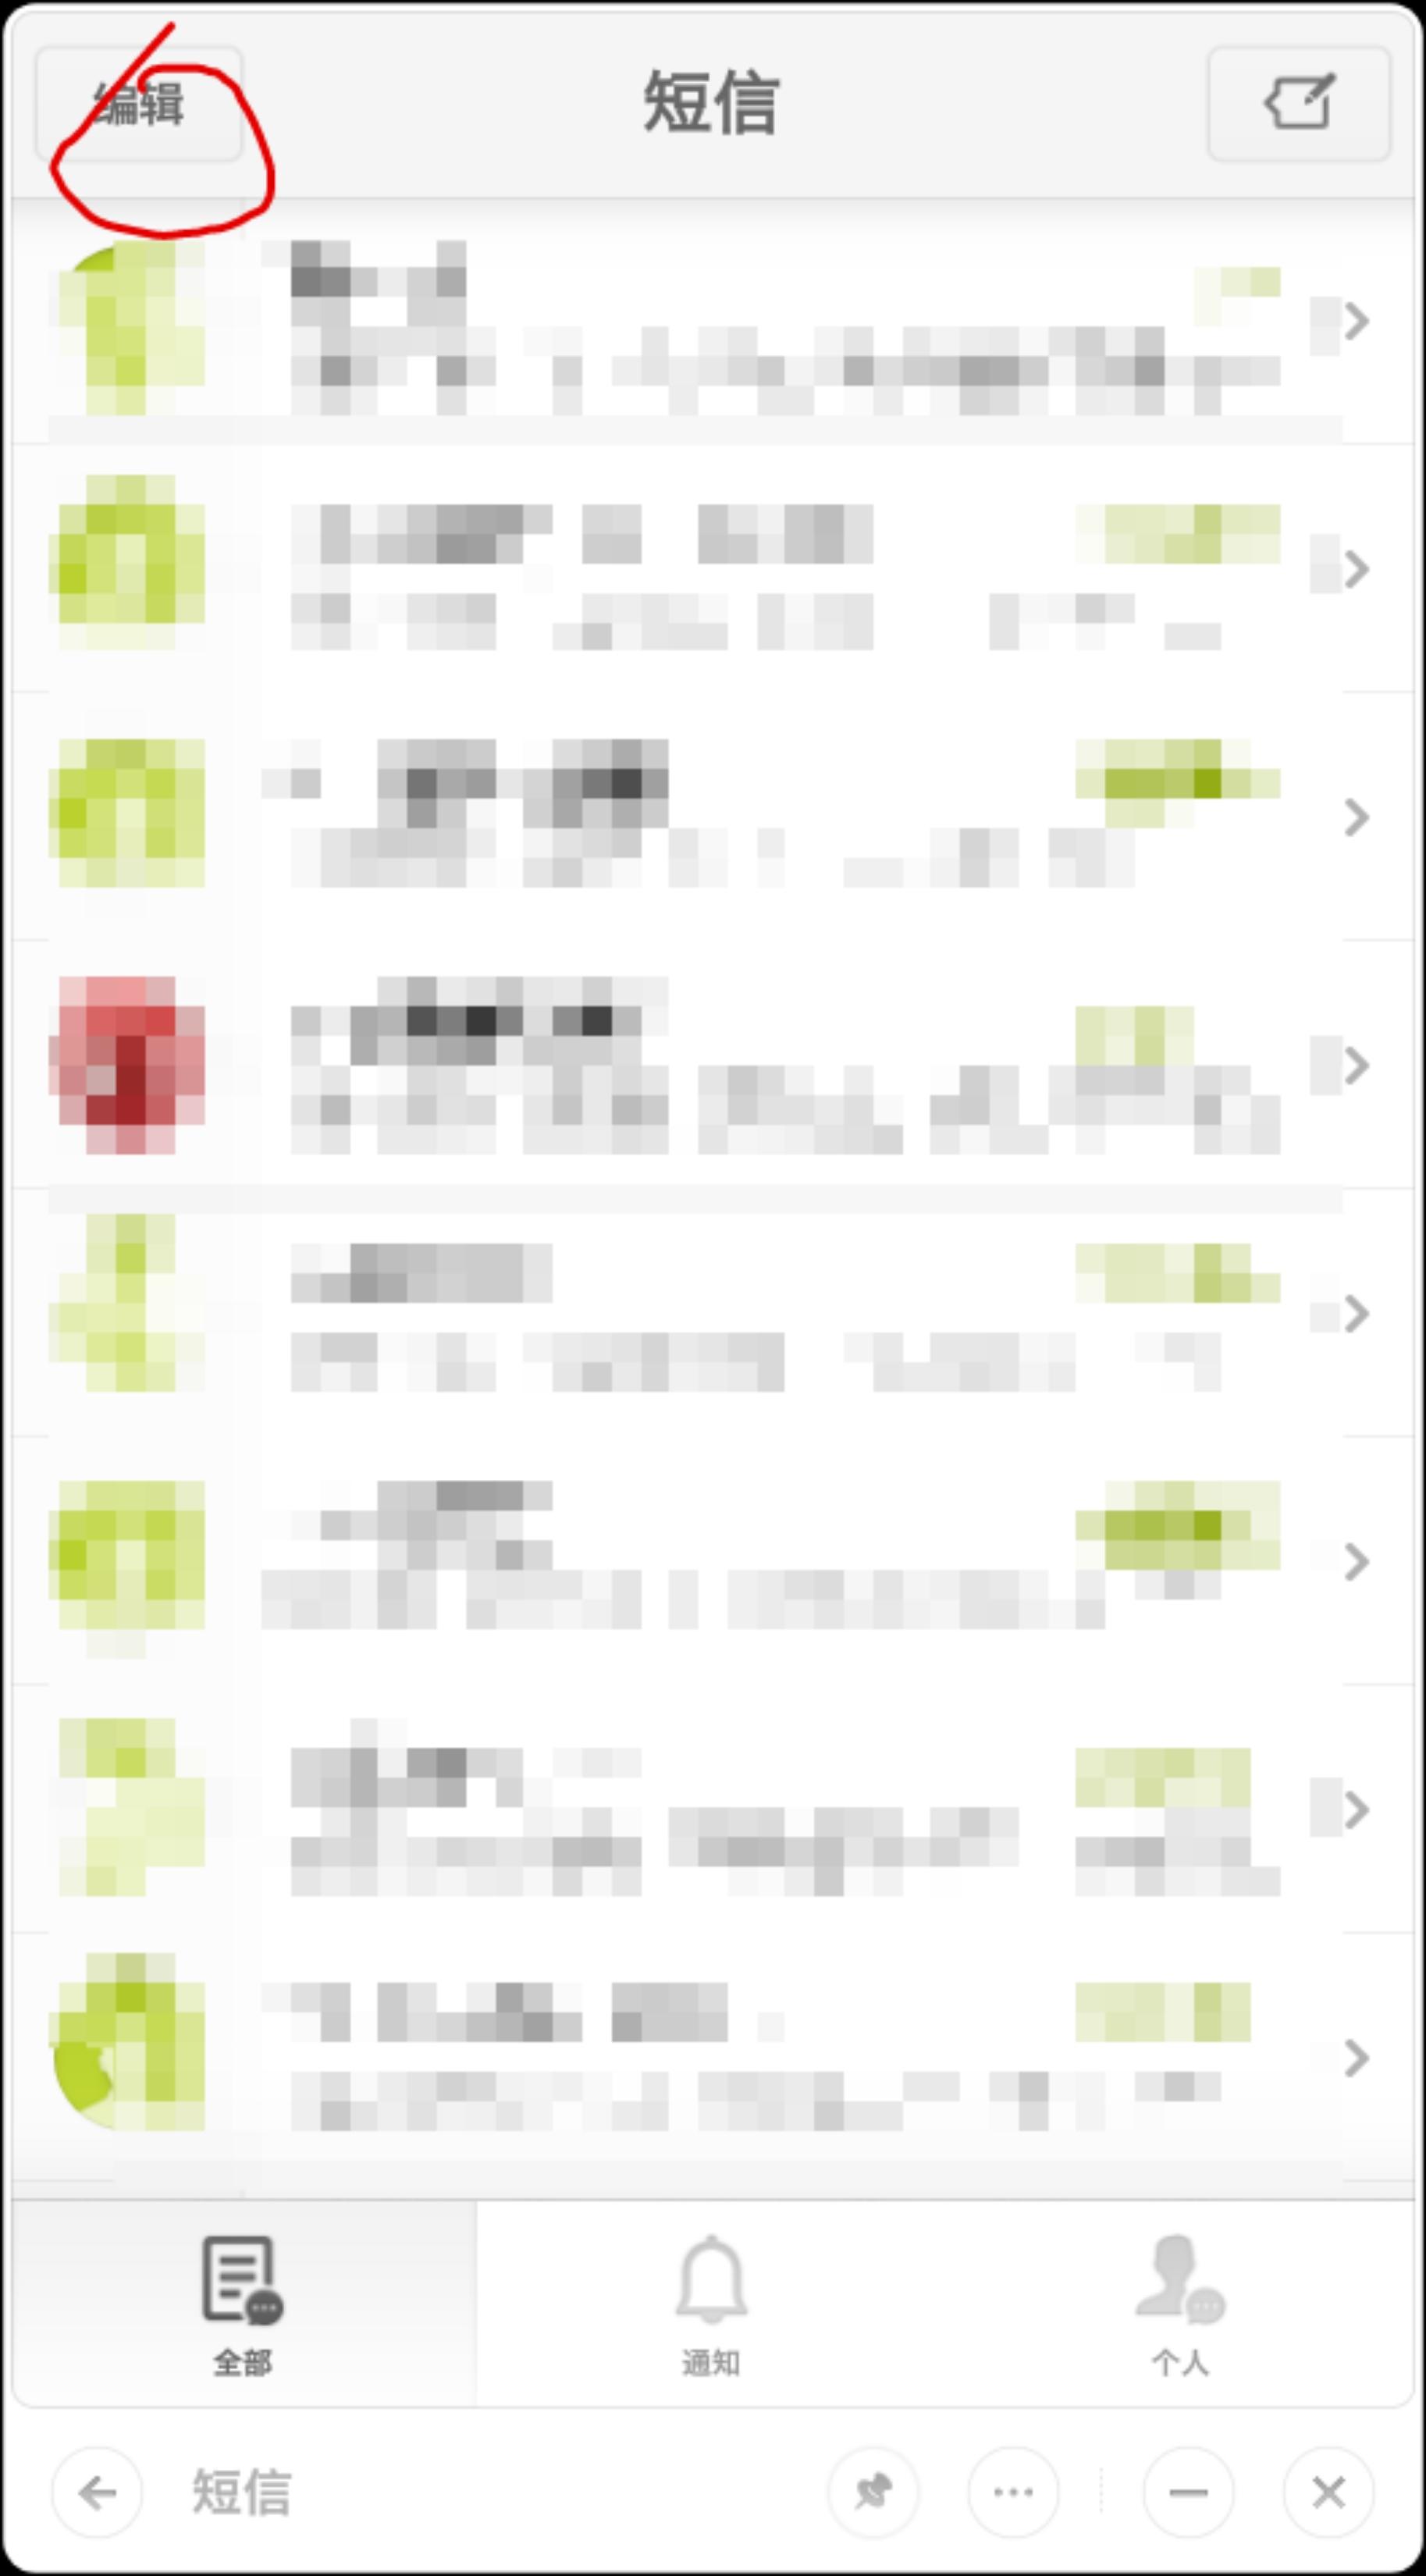 ??_Screenshot_2019-08-24-17-52-18-241_com.android.mms_1.png